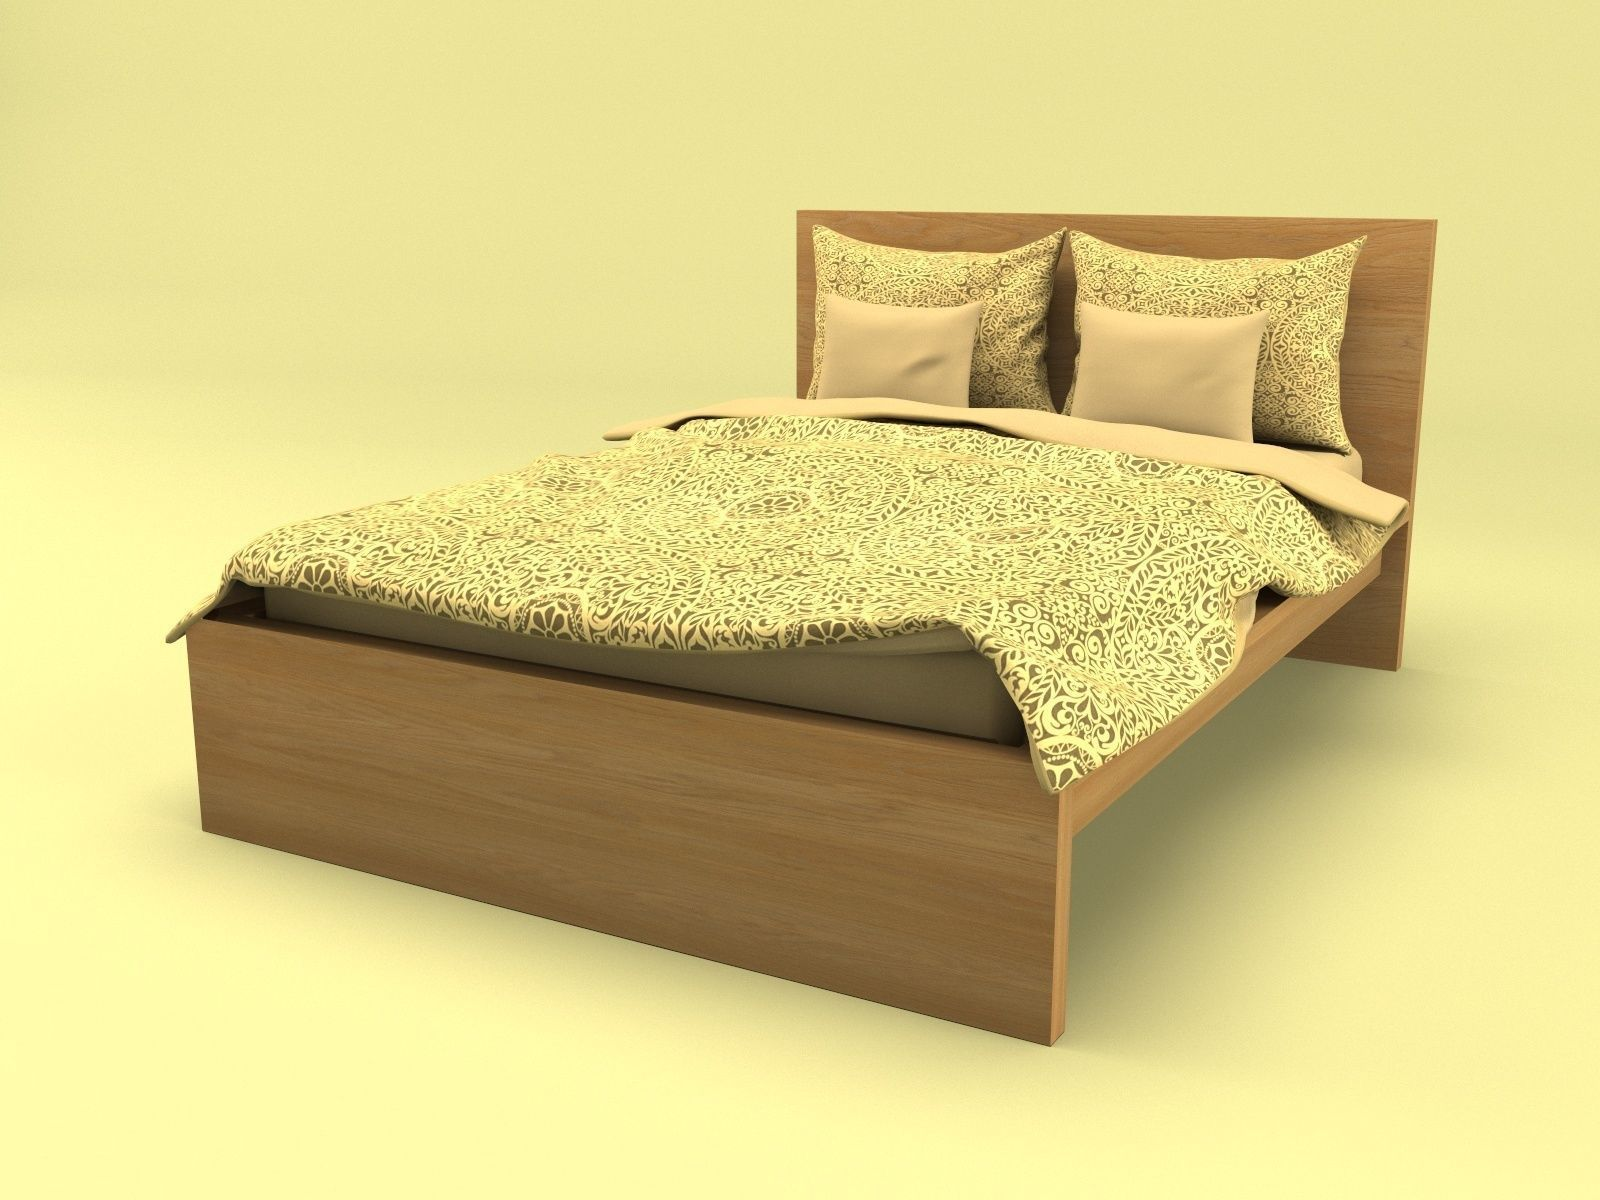 Ikea Malm Bed 3d Model Vr Ar Ready Cgtrader